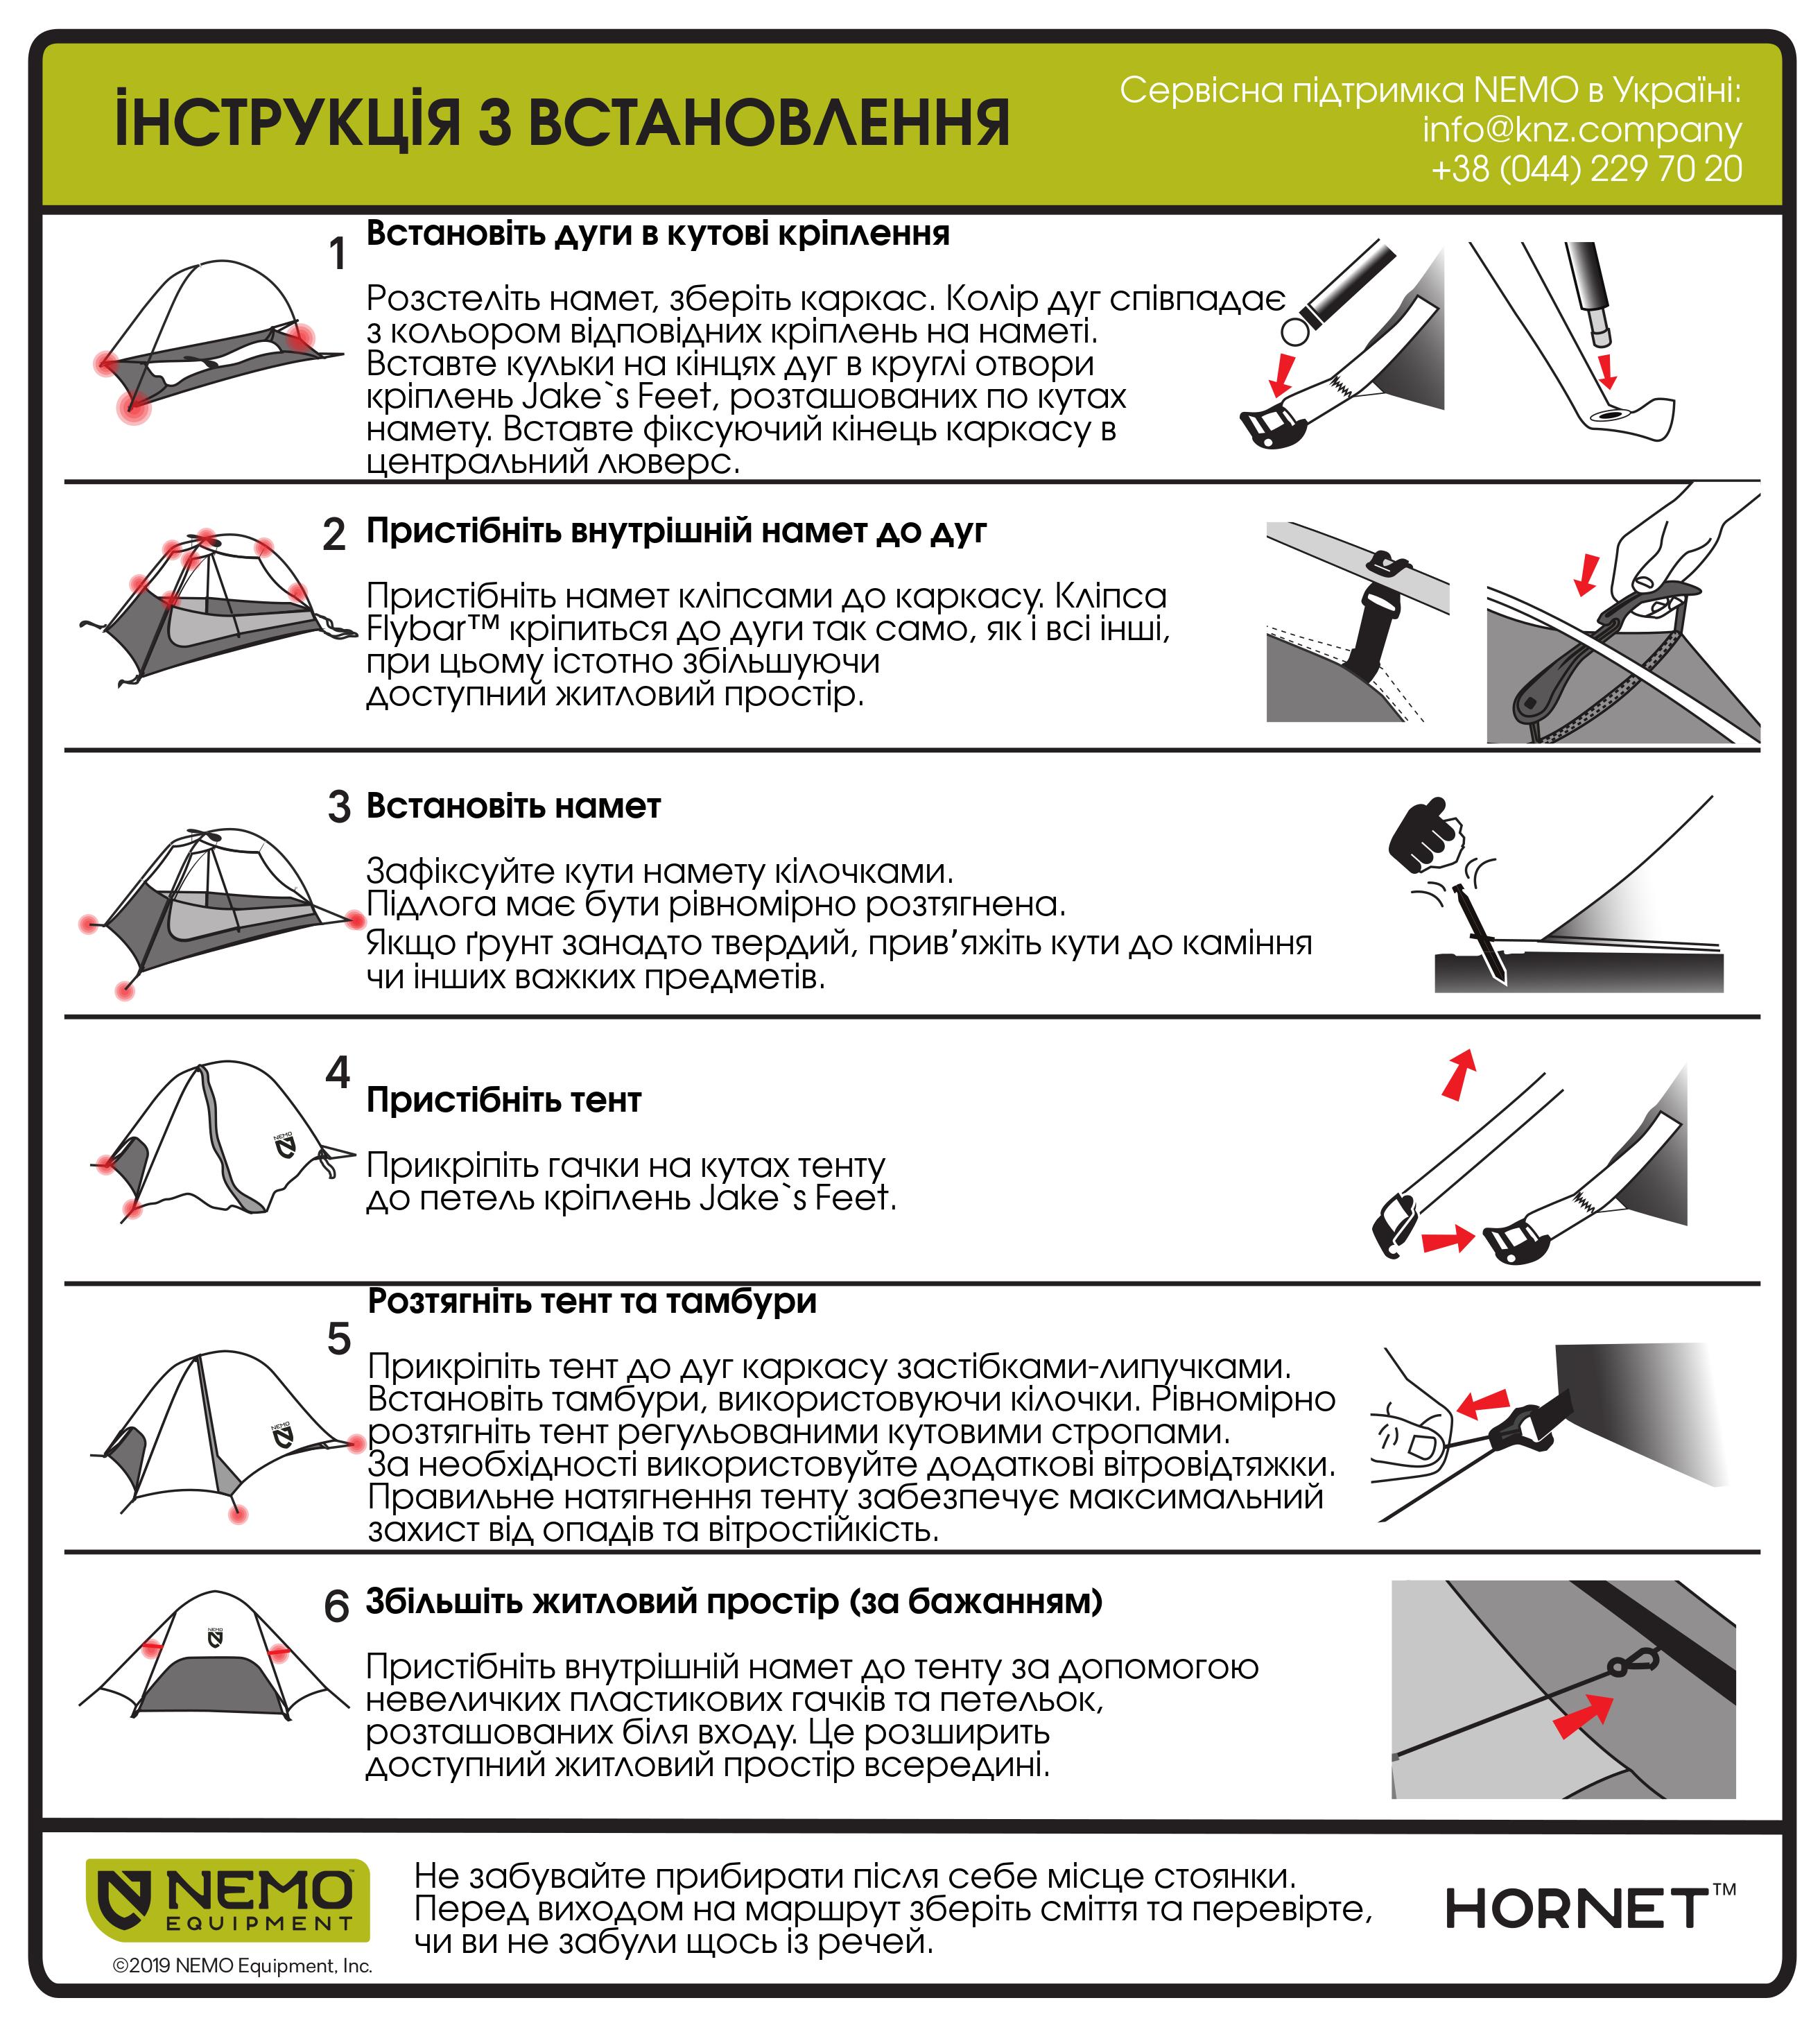 Установка палатки NEMO Hornet